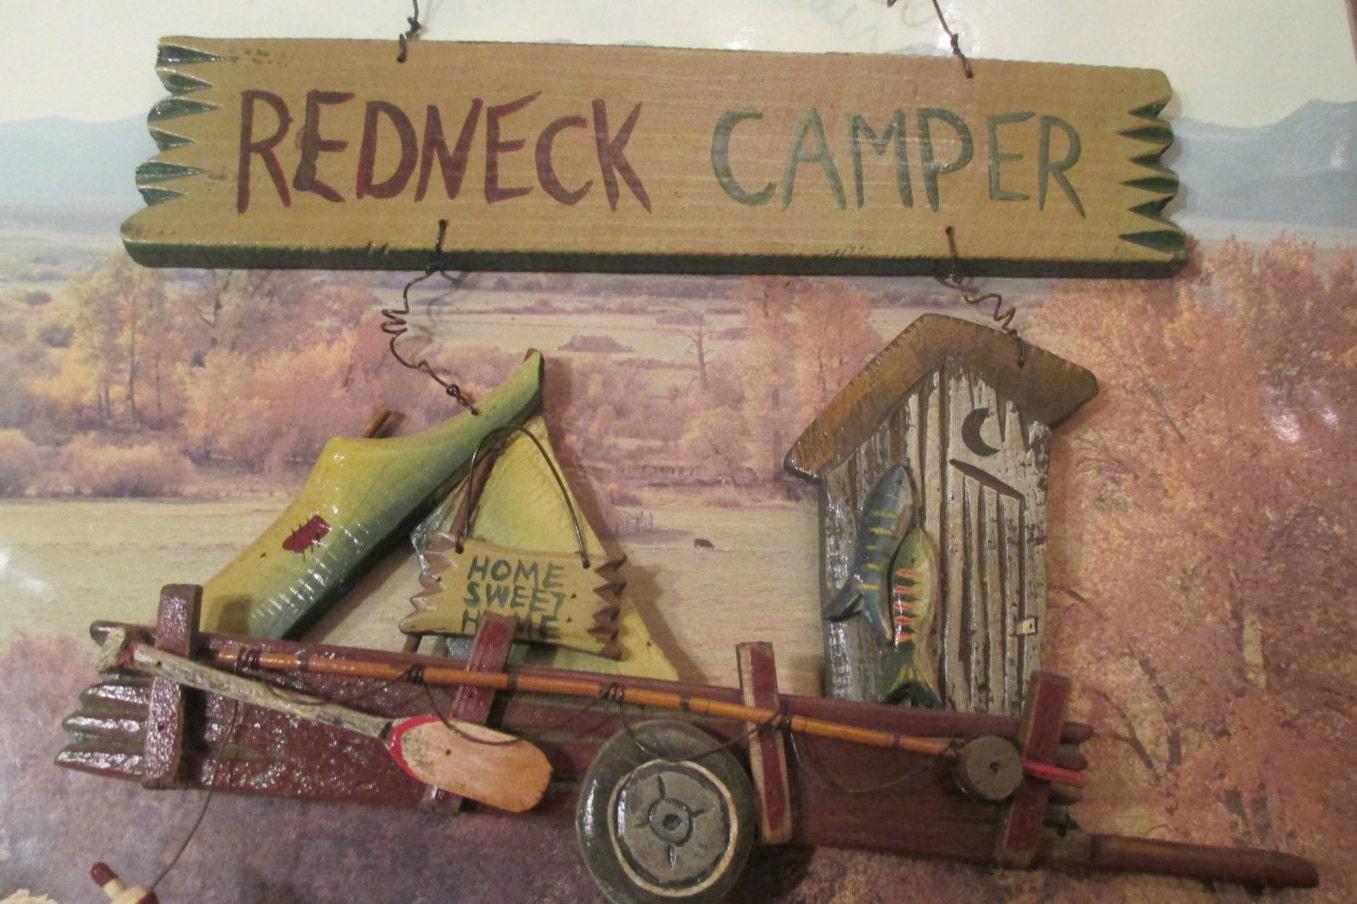 Redneck Man Cave Decor : Redneck camper w wire hanger wooden sign rustic